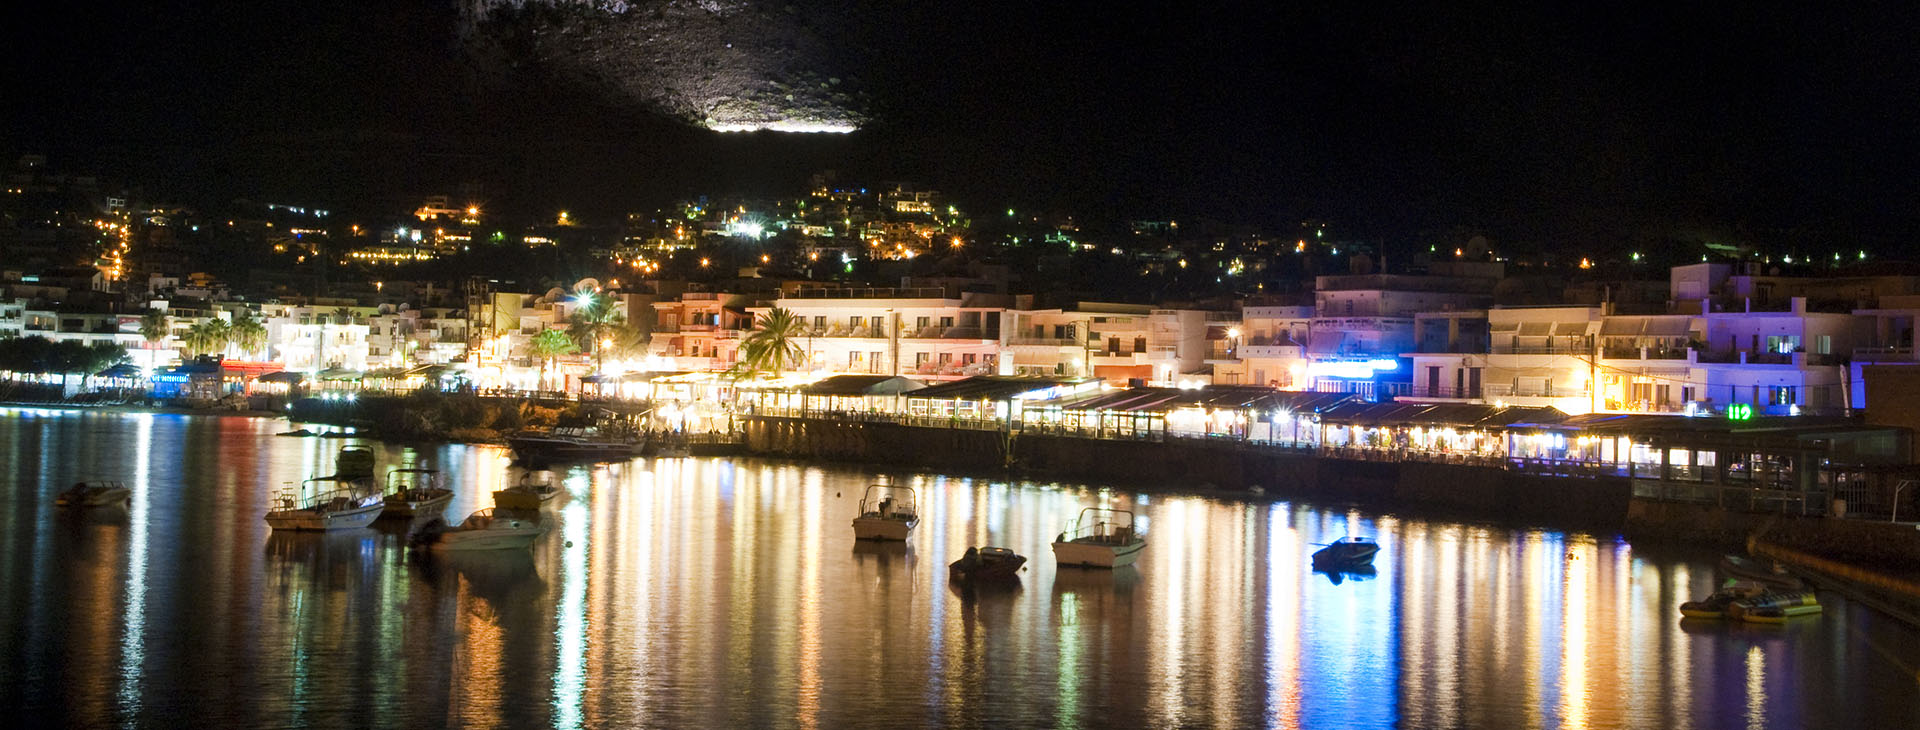 Hersonissos by night, Heraklion